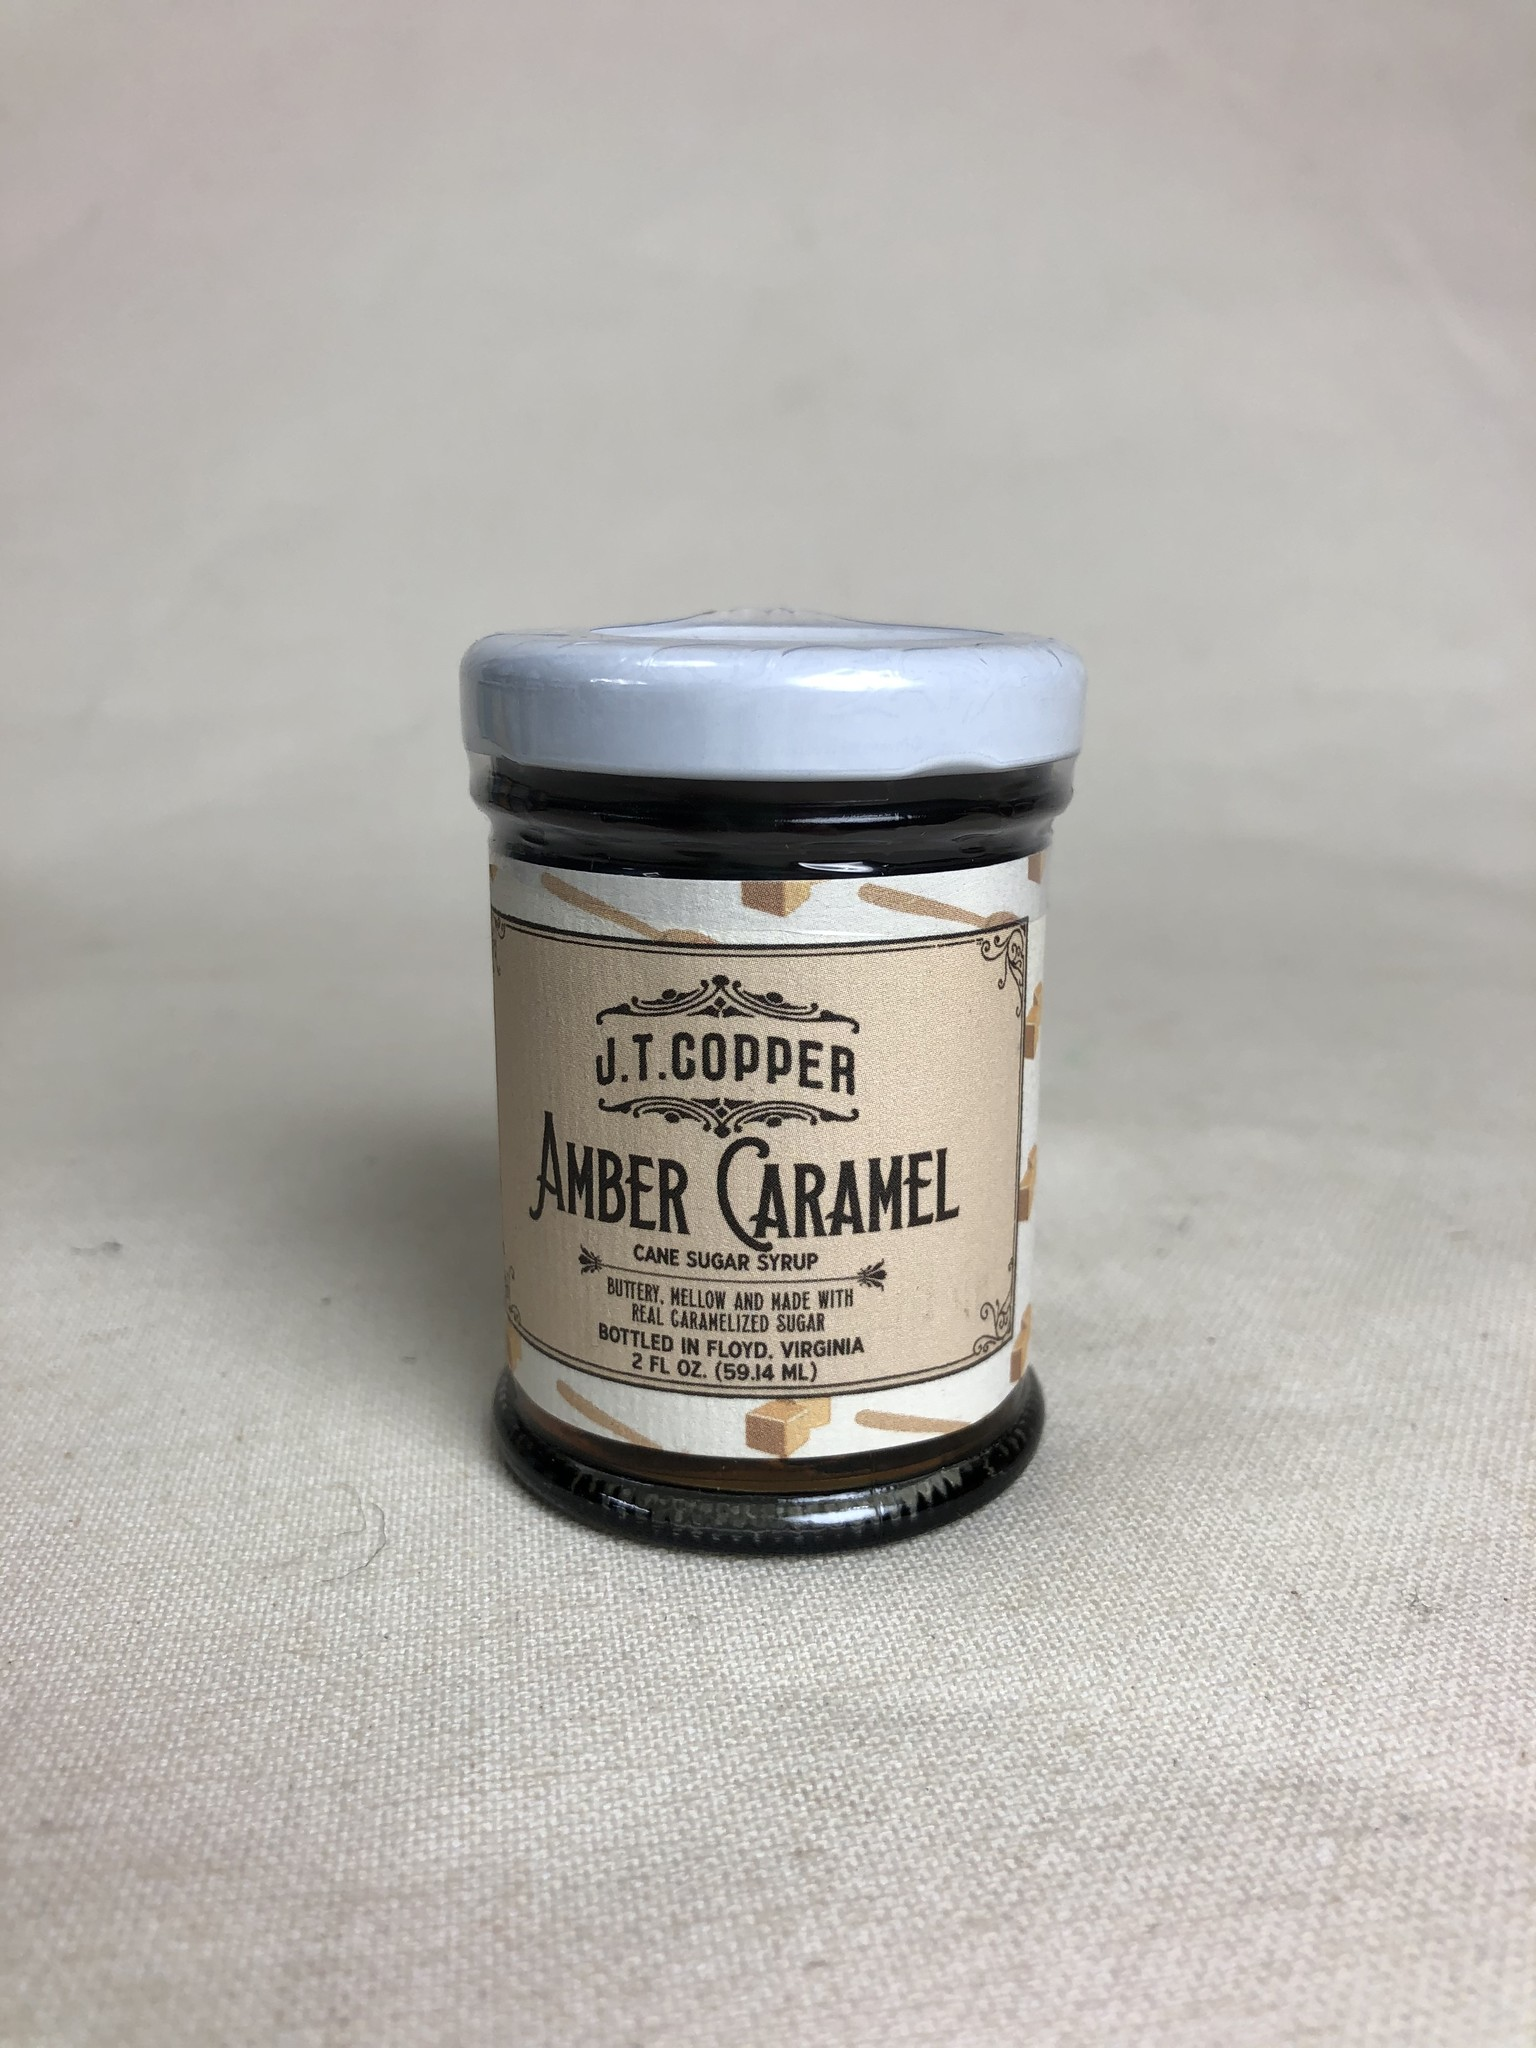 JTC Amber Caramel Cane Syrup